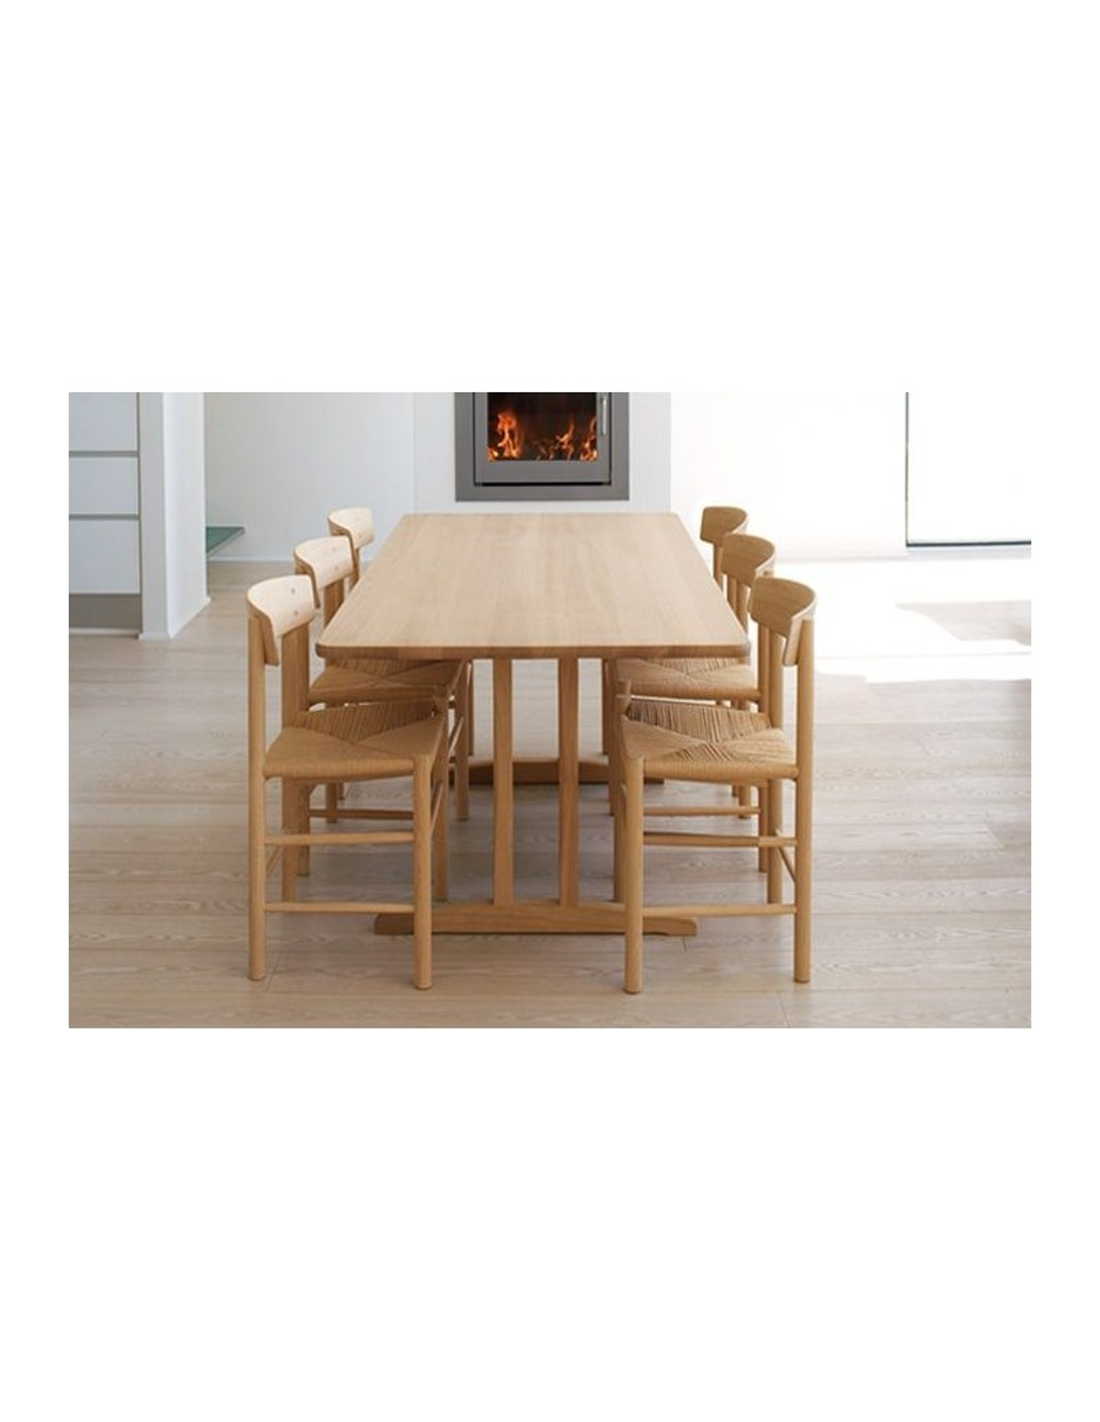 top chaise classic classic classic classic with chaise borje. Black Bedroom Furniture Sets. Home Design Ideas